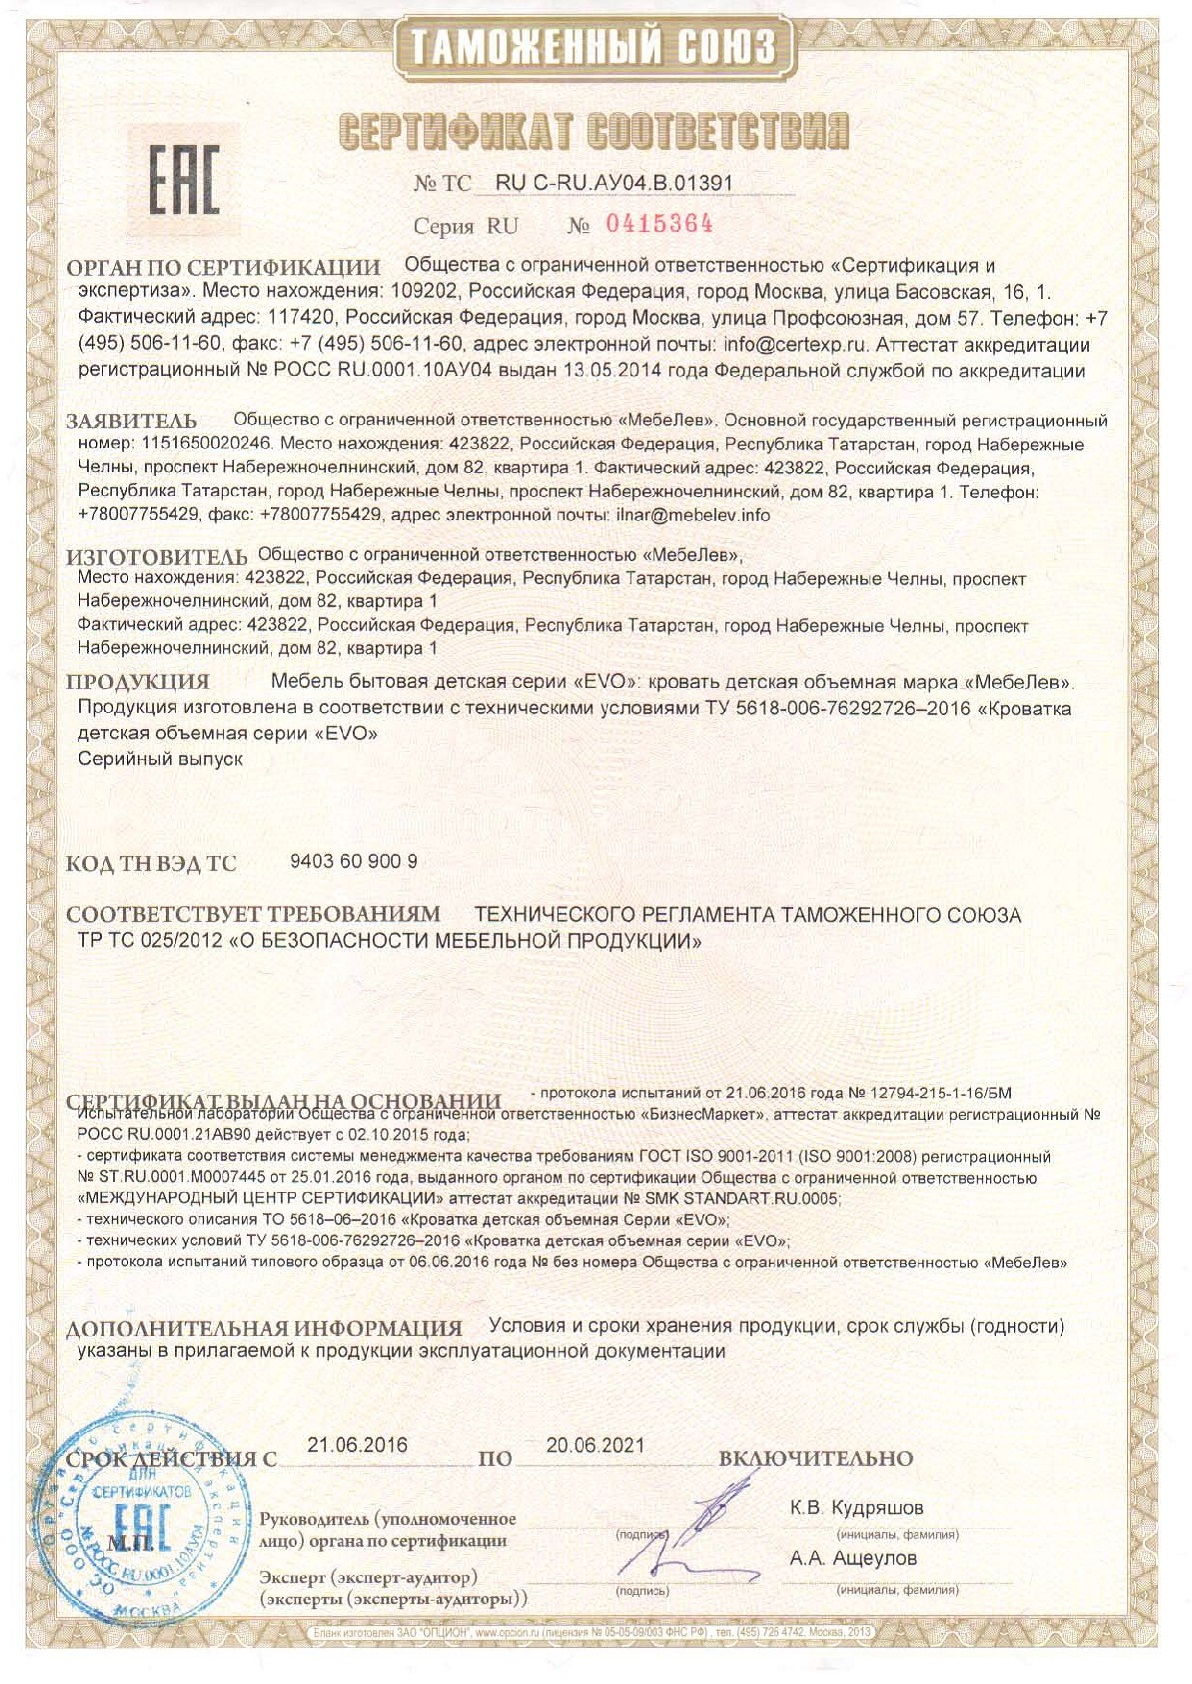 003_Сертификат_соответсвия_на_EVO-001.jpg